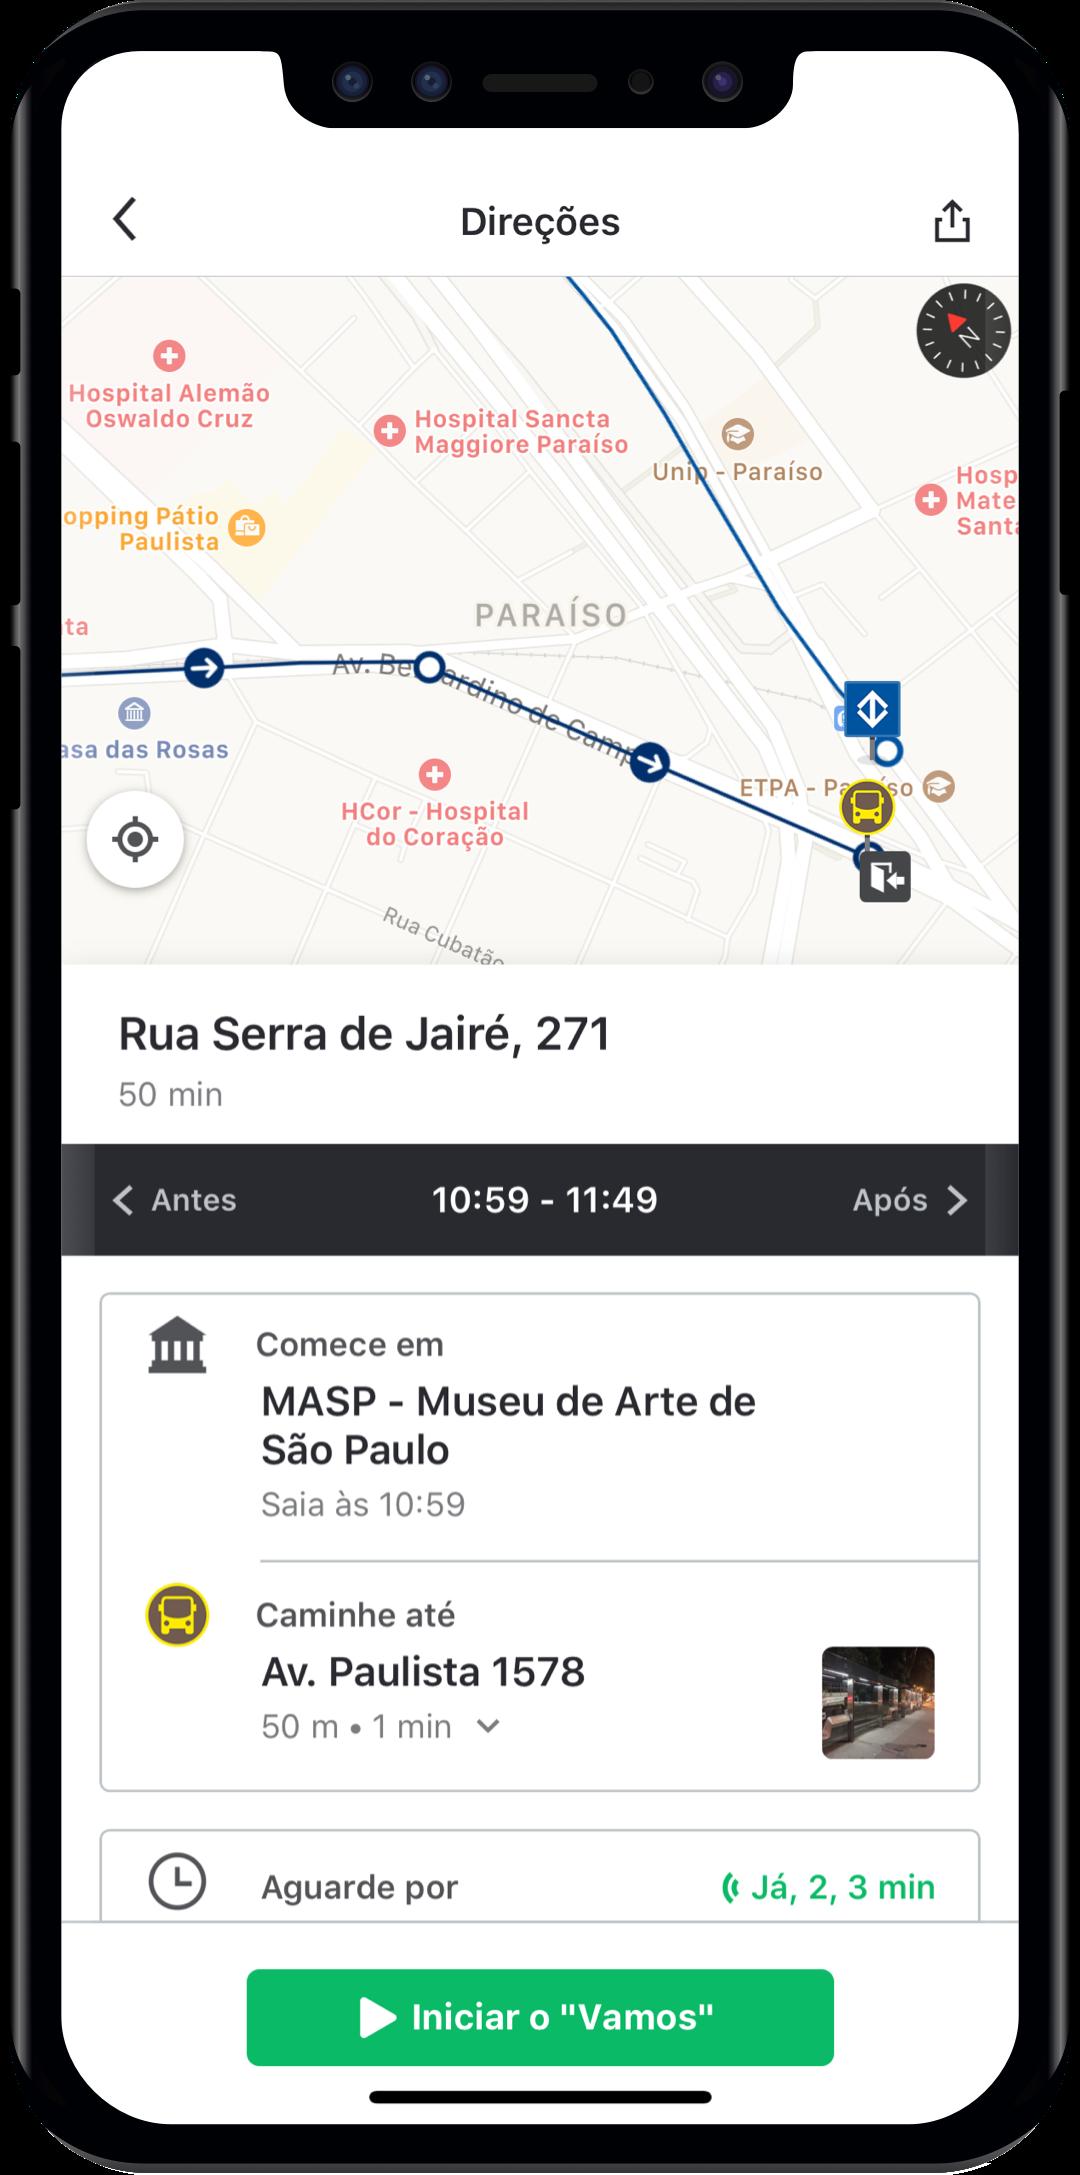 In_Phone_Moovit_iPhoneX_5.36_Brazil_SP_Portuguese (Brazil)_03